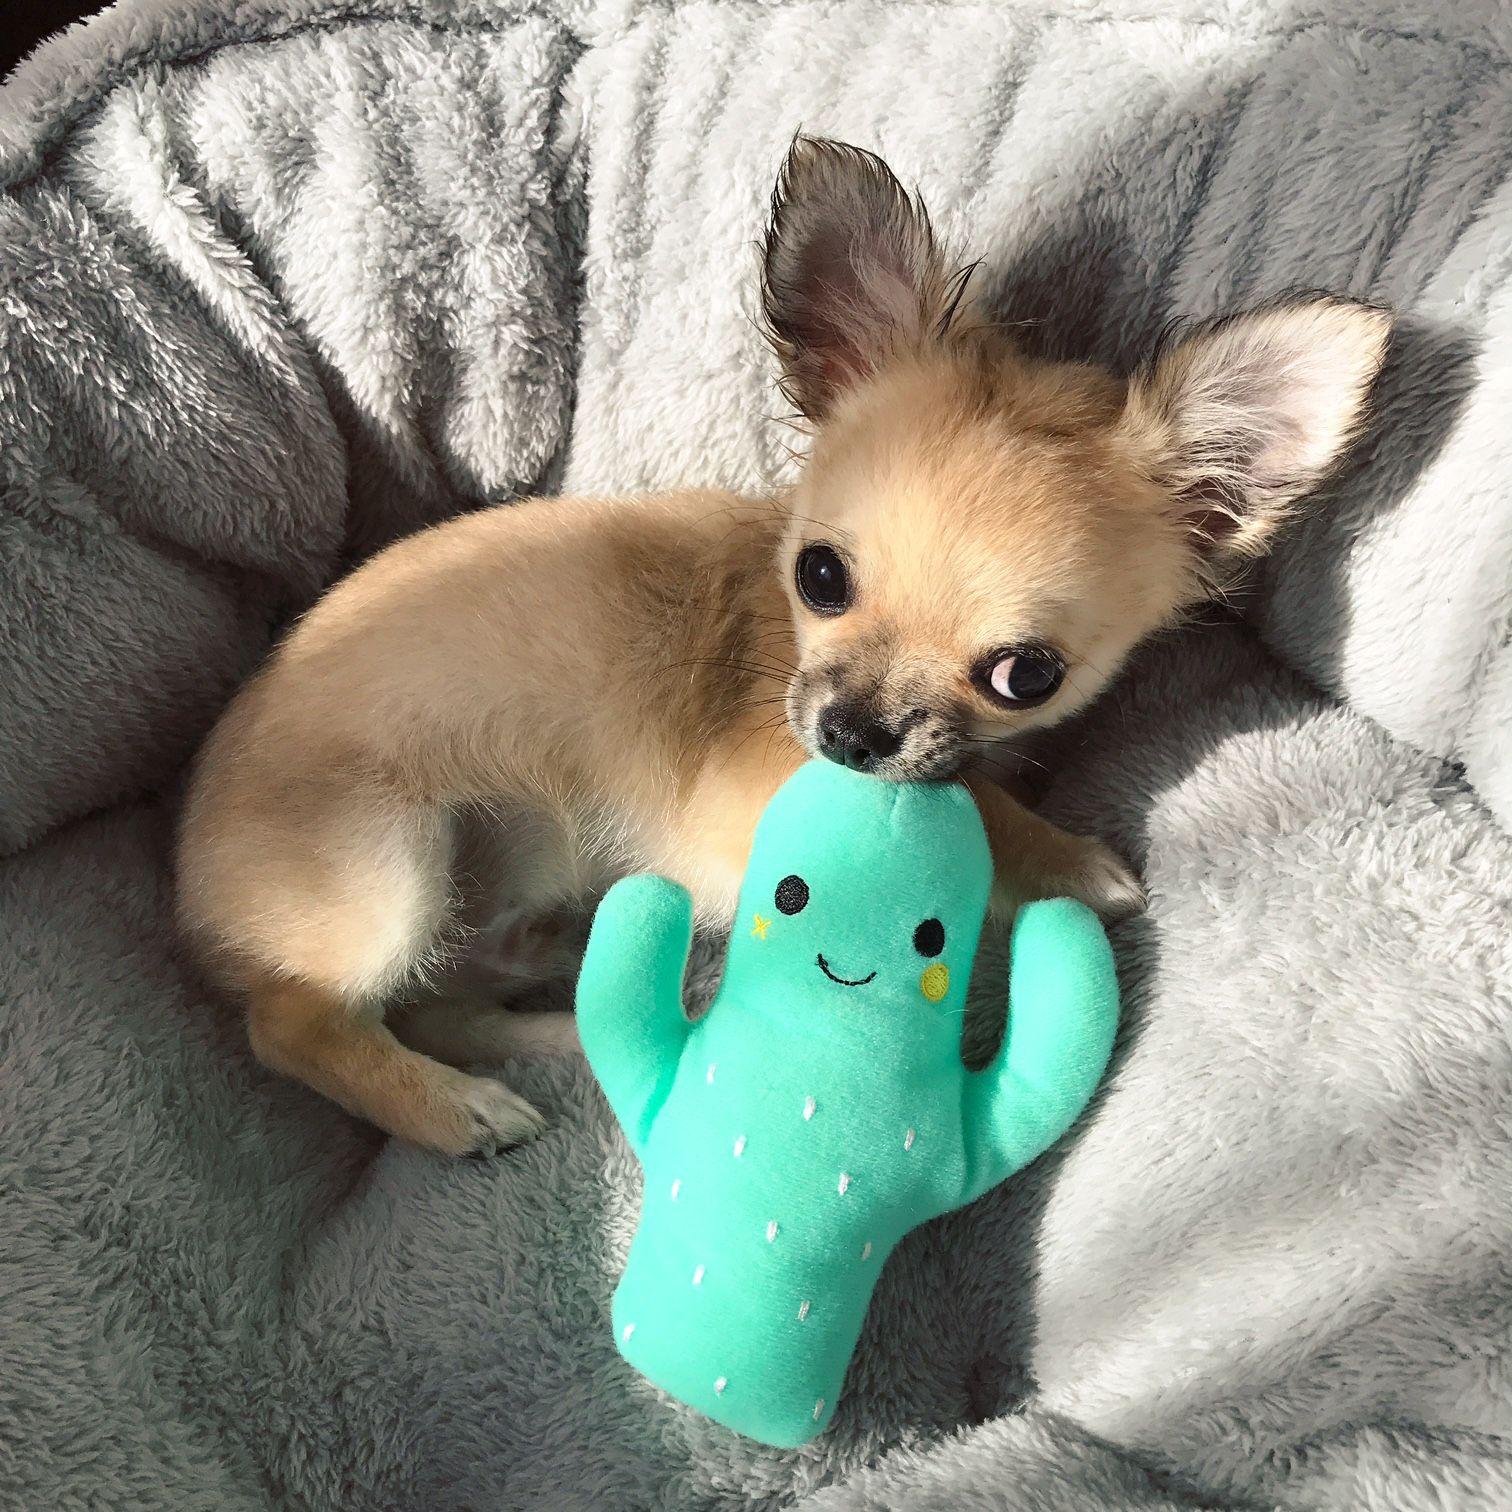 Lately Perth Beauty Blogger Katie Rebekah Puppy Chihuahua Chihuahua Puppies Chihuahua Pets